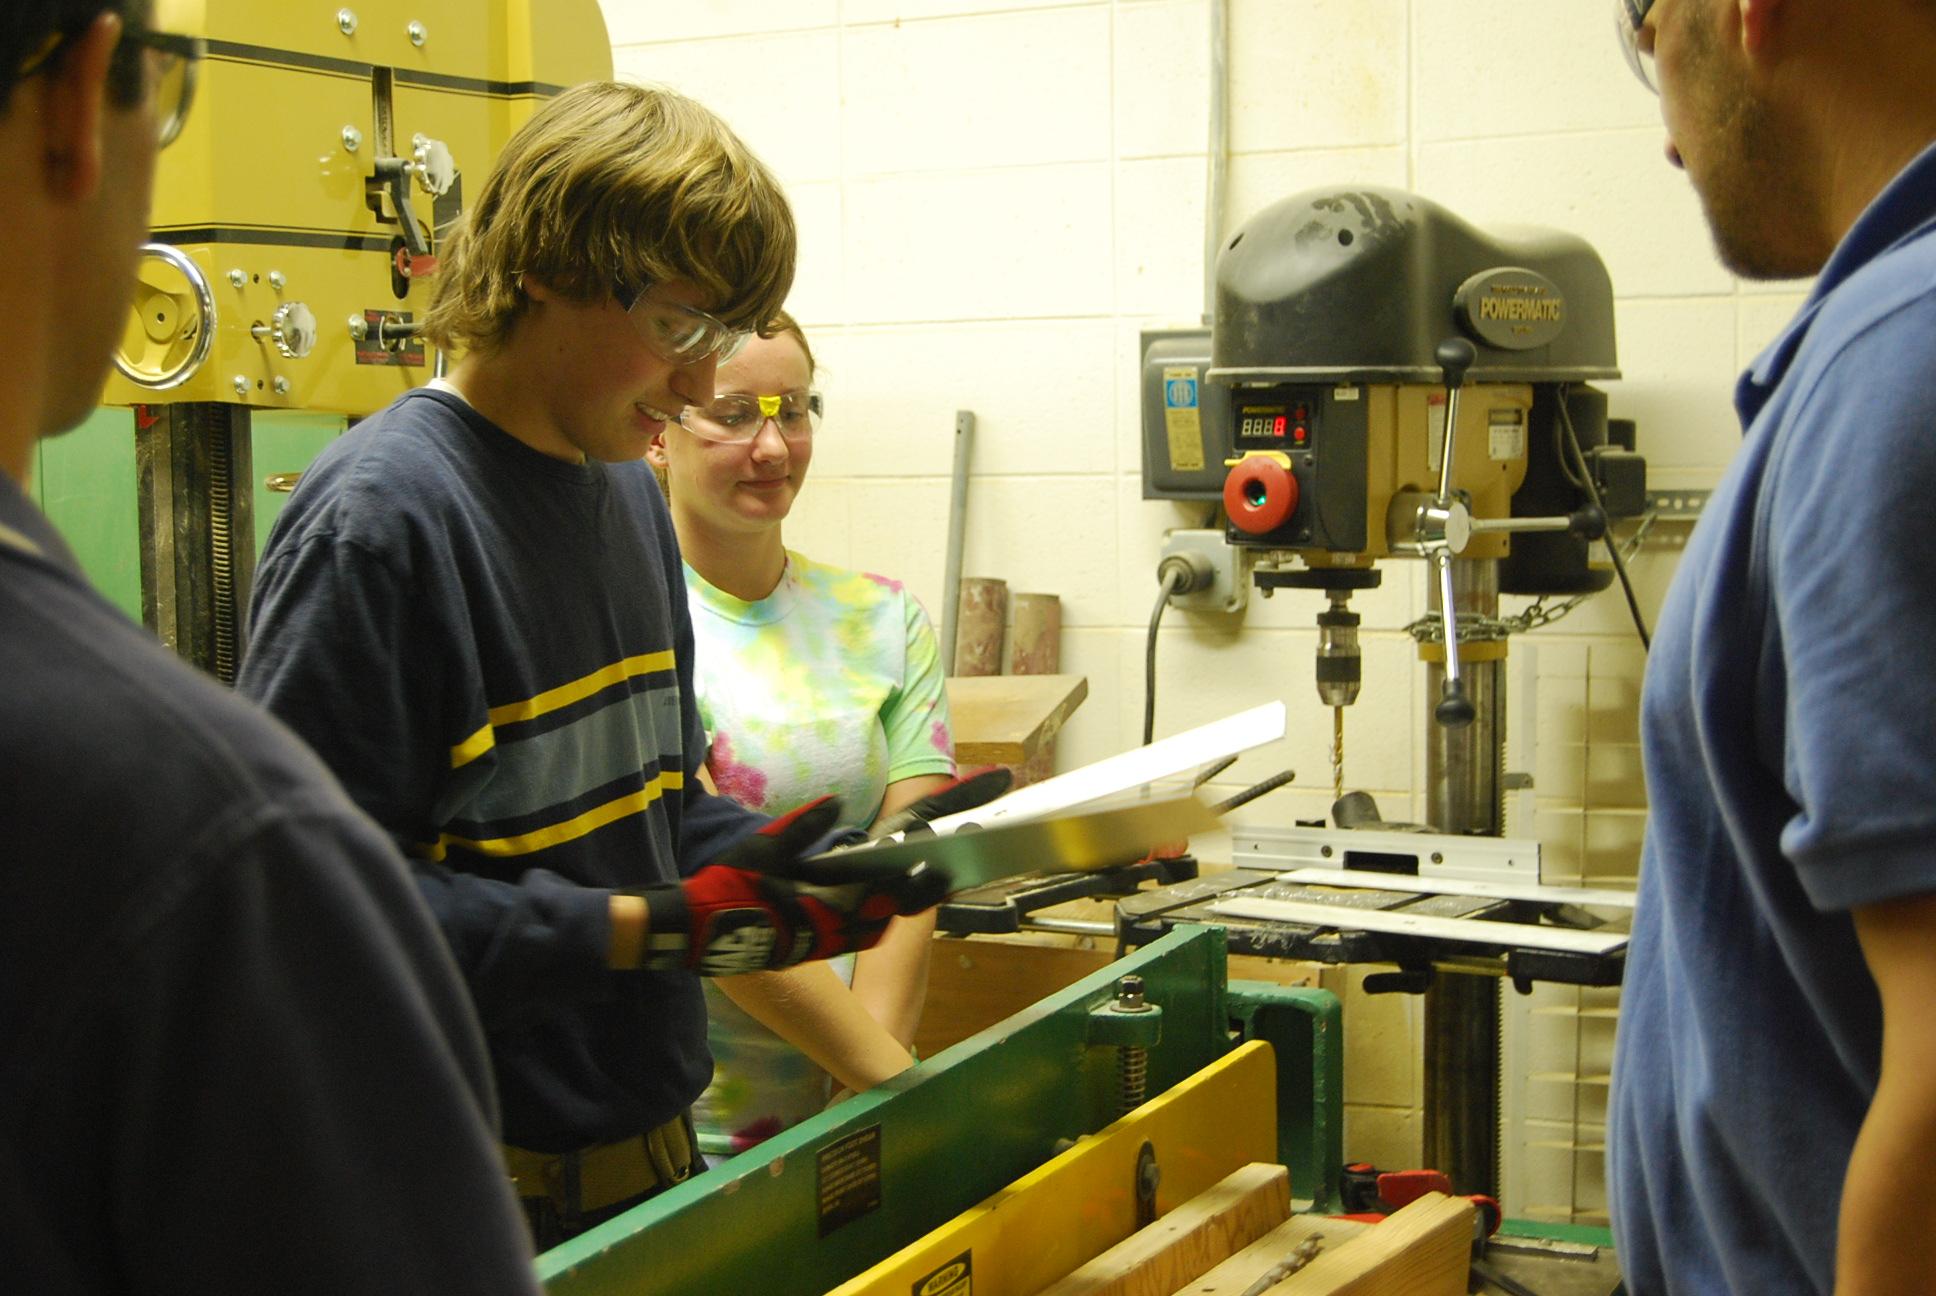 Fabricating robot parts